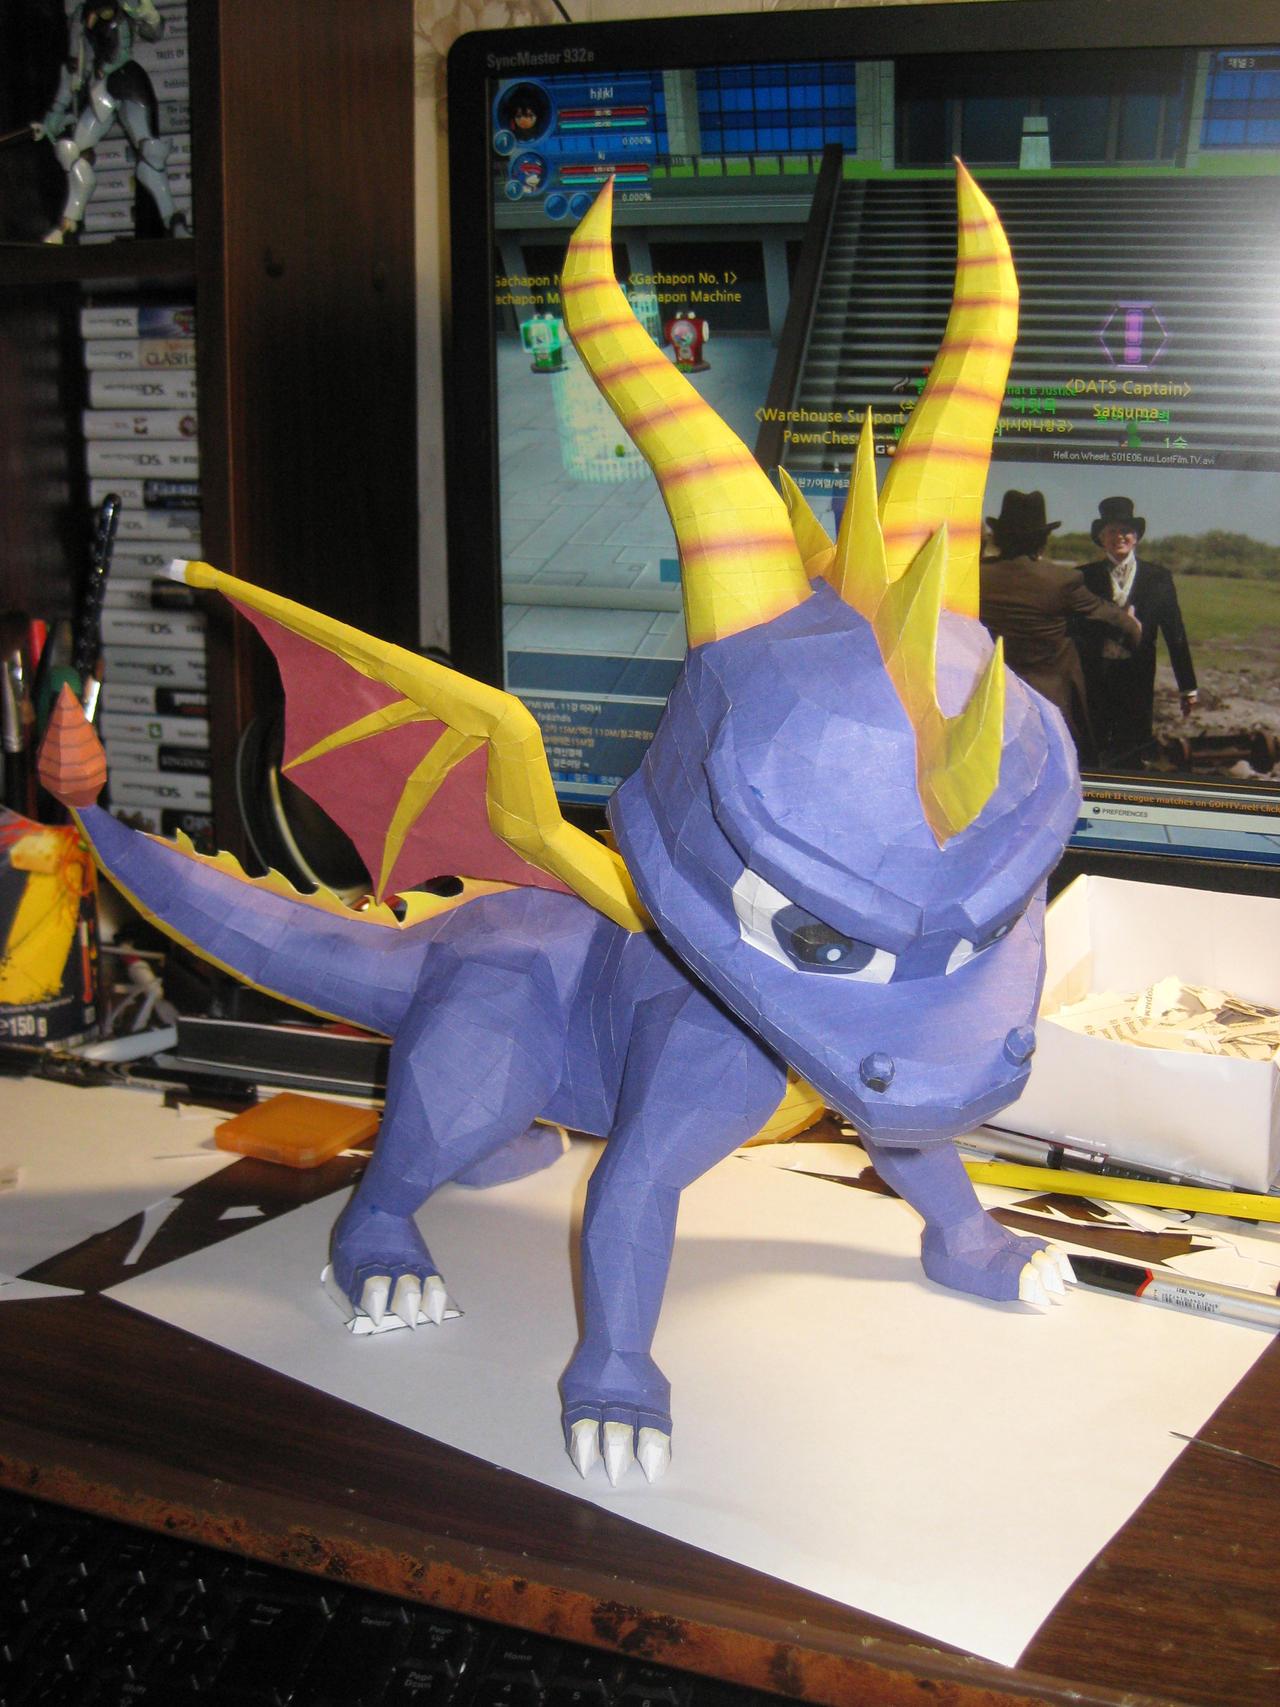 Spyro papercraft by Zimberdum